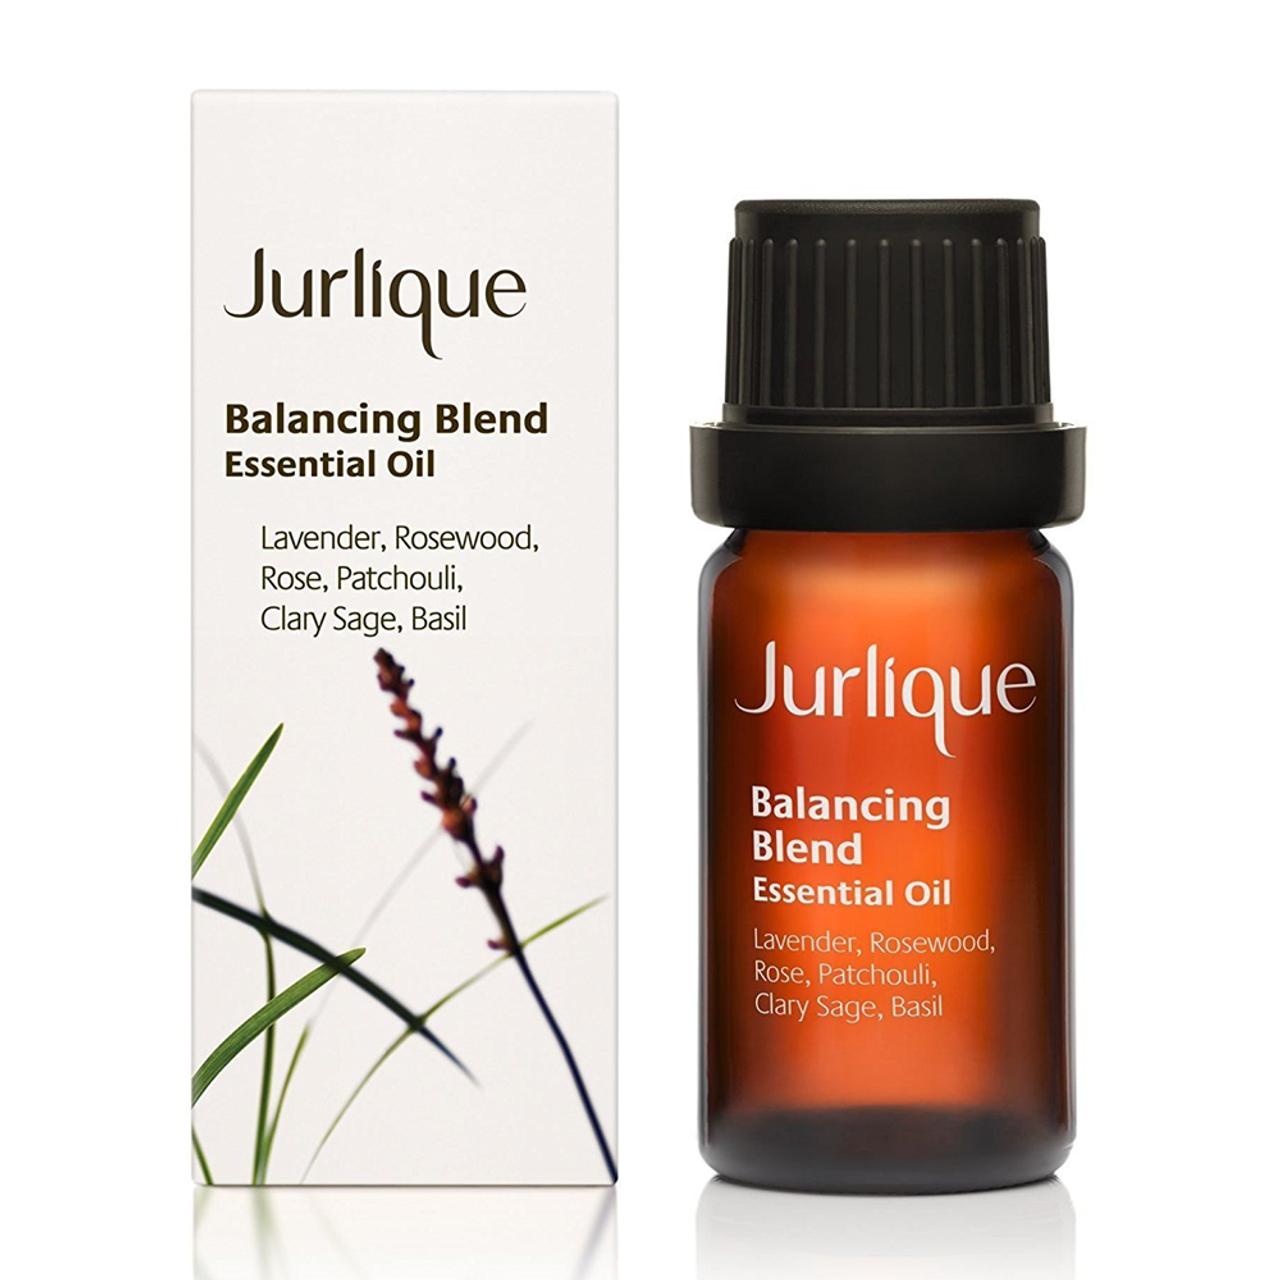 Jurlique Balancing Blend Essential Oil